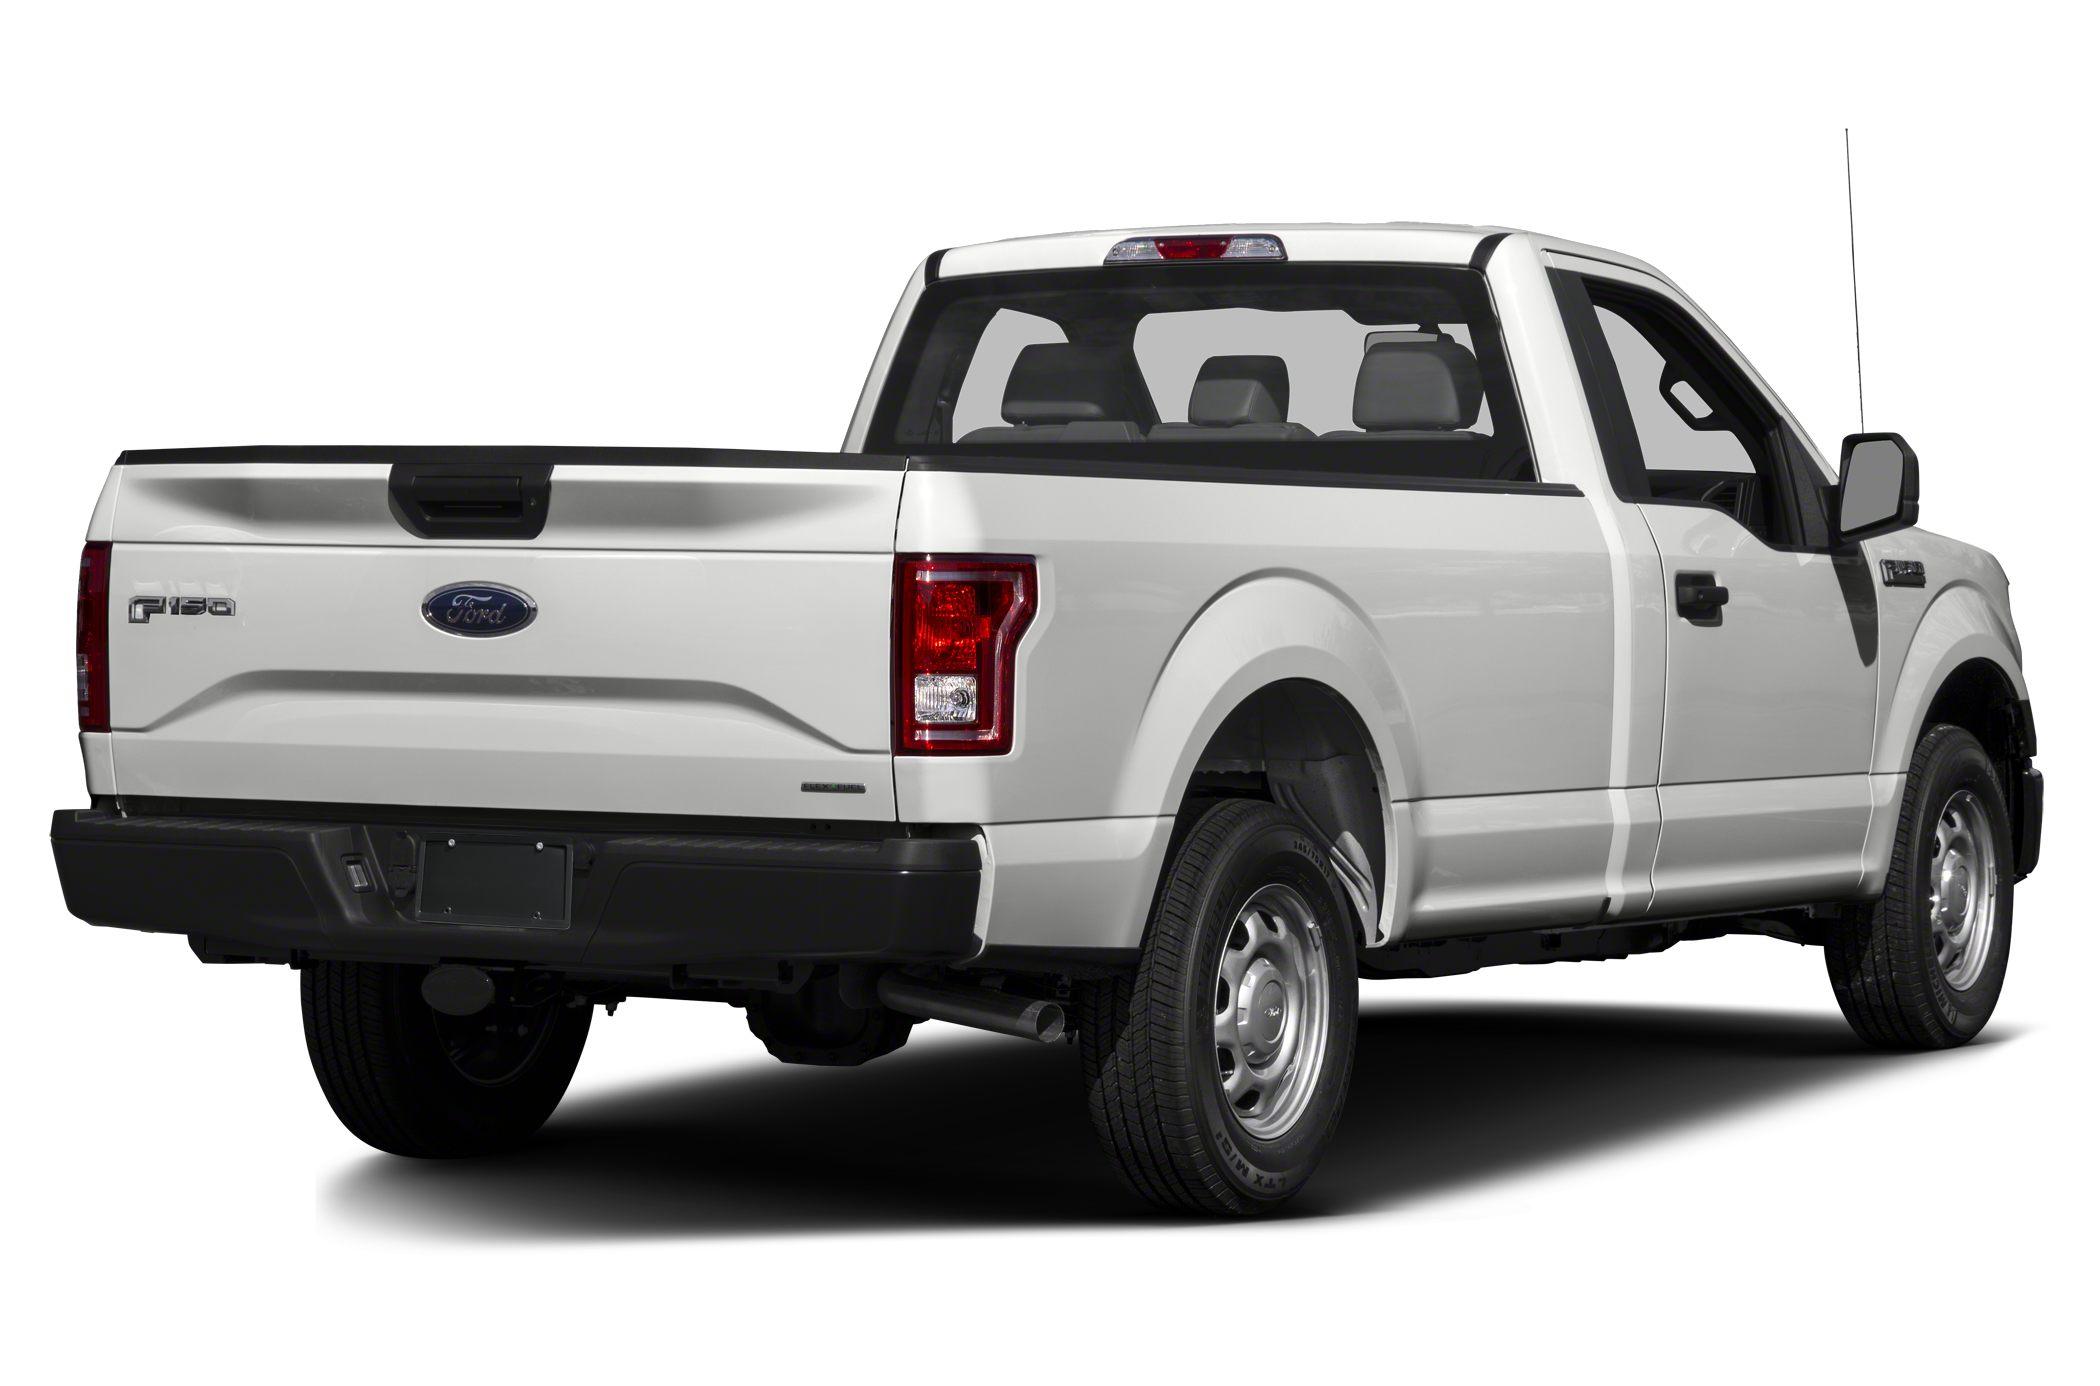 comparison chevrolet colorado extended cab base 2015 vs ford f 150 xl regular cab 2015. Black Bedroom Furniture Sets. Home Design Ideas